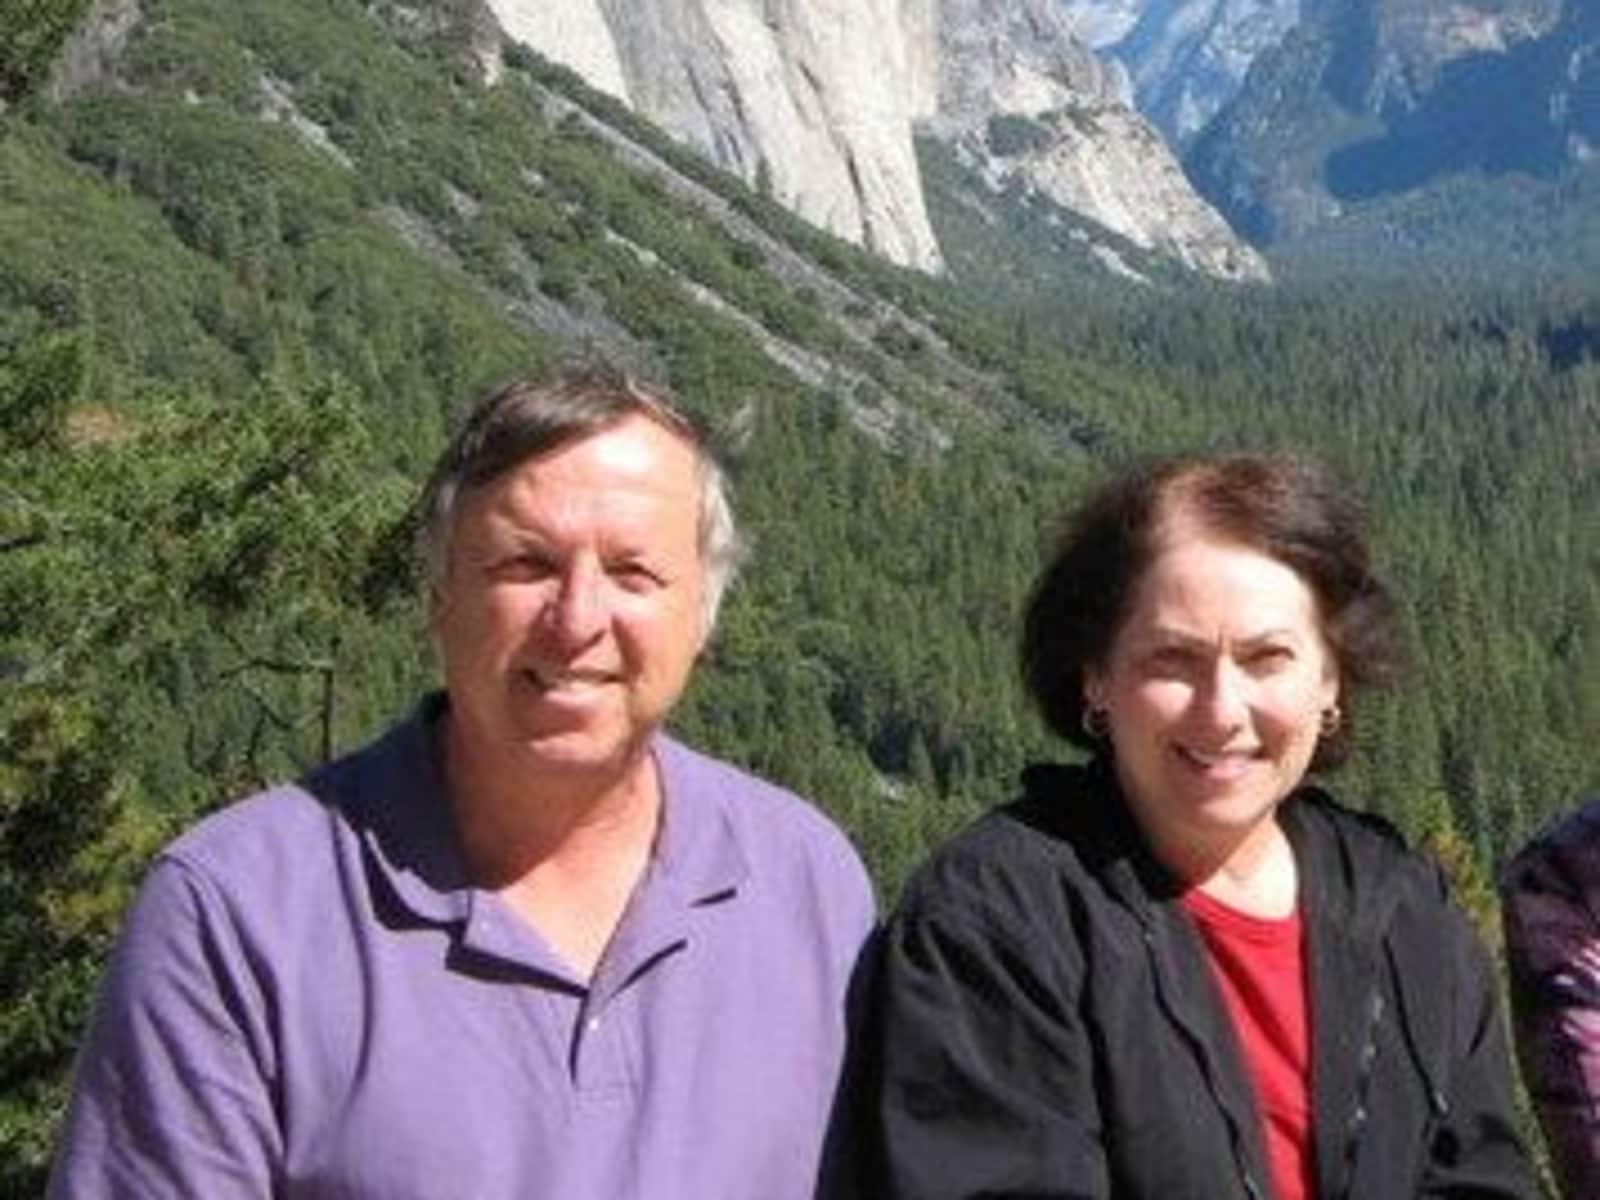 Kathy & Dan from Reno, Nevada, United States